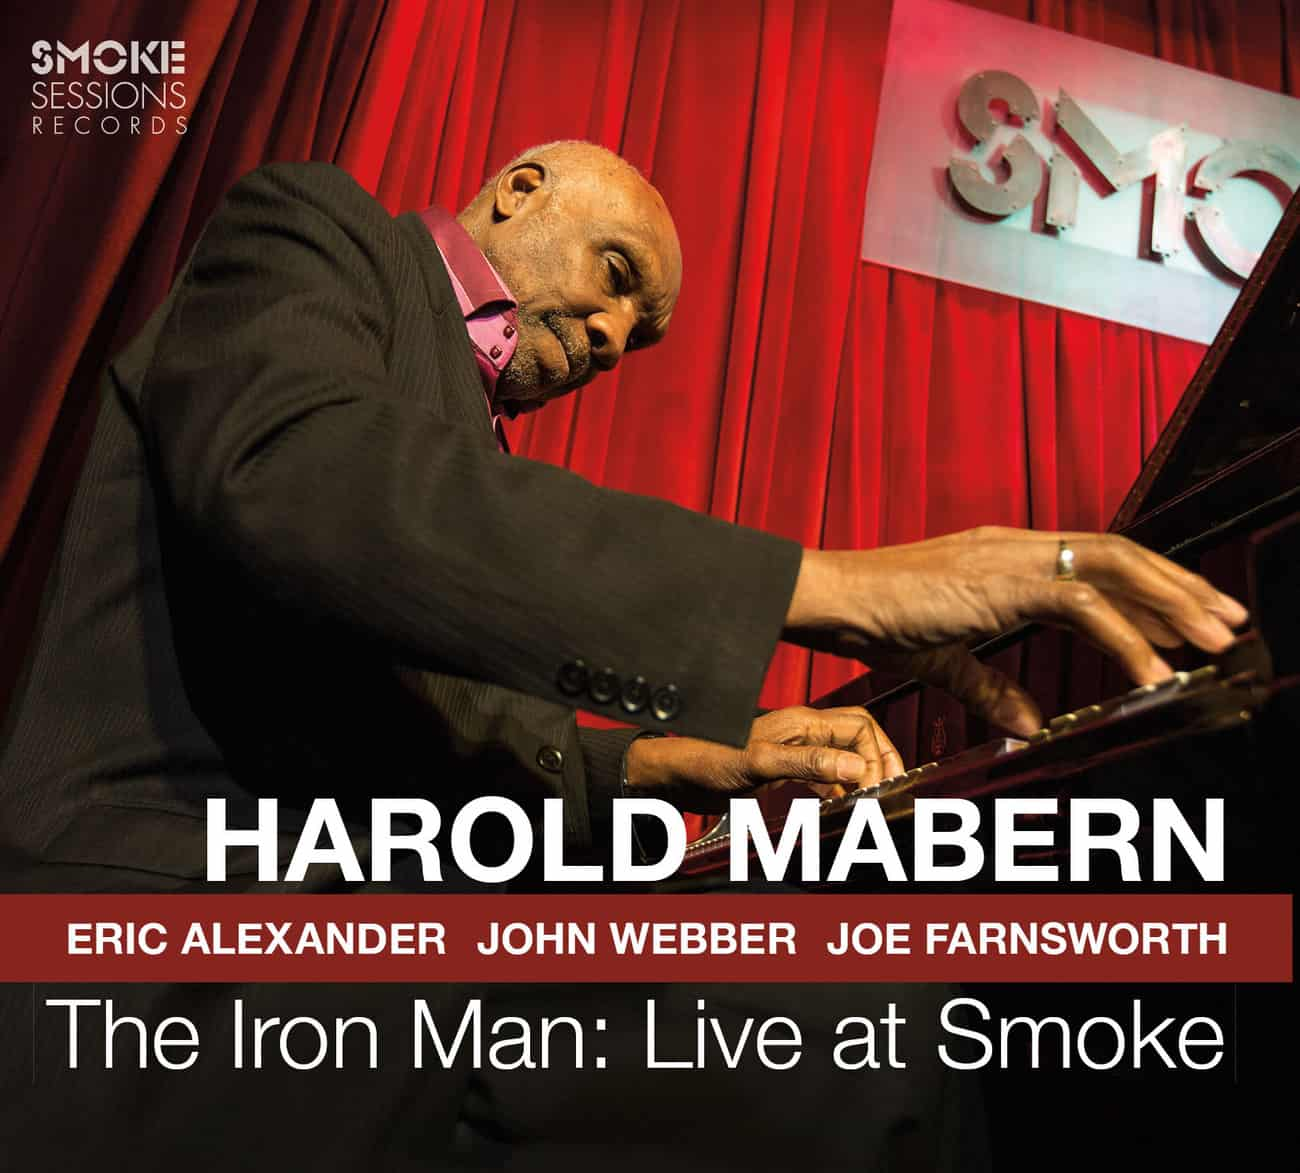 Harold Mabern THE IRON MAN LIVE AT SMOKE_Cover WEB